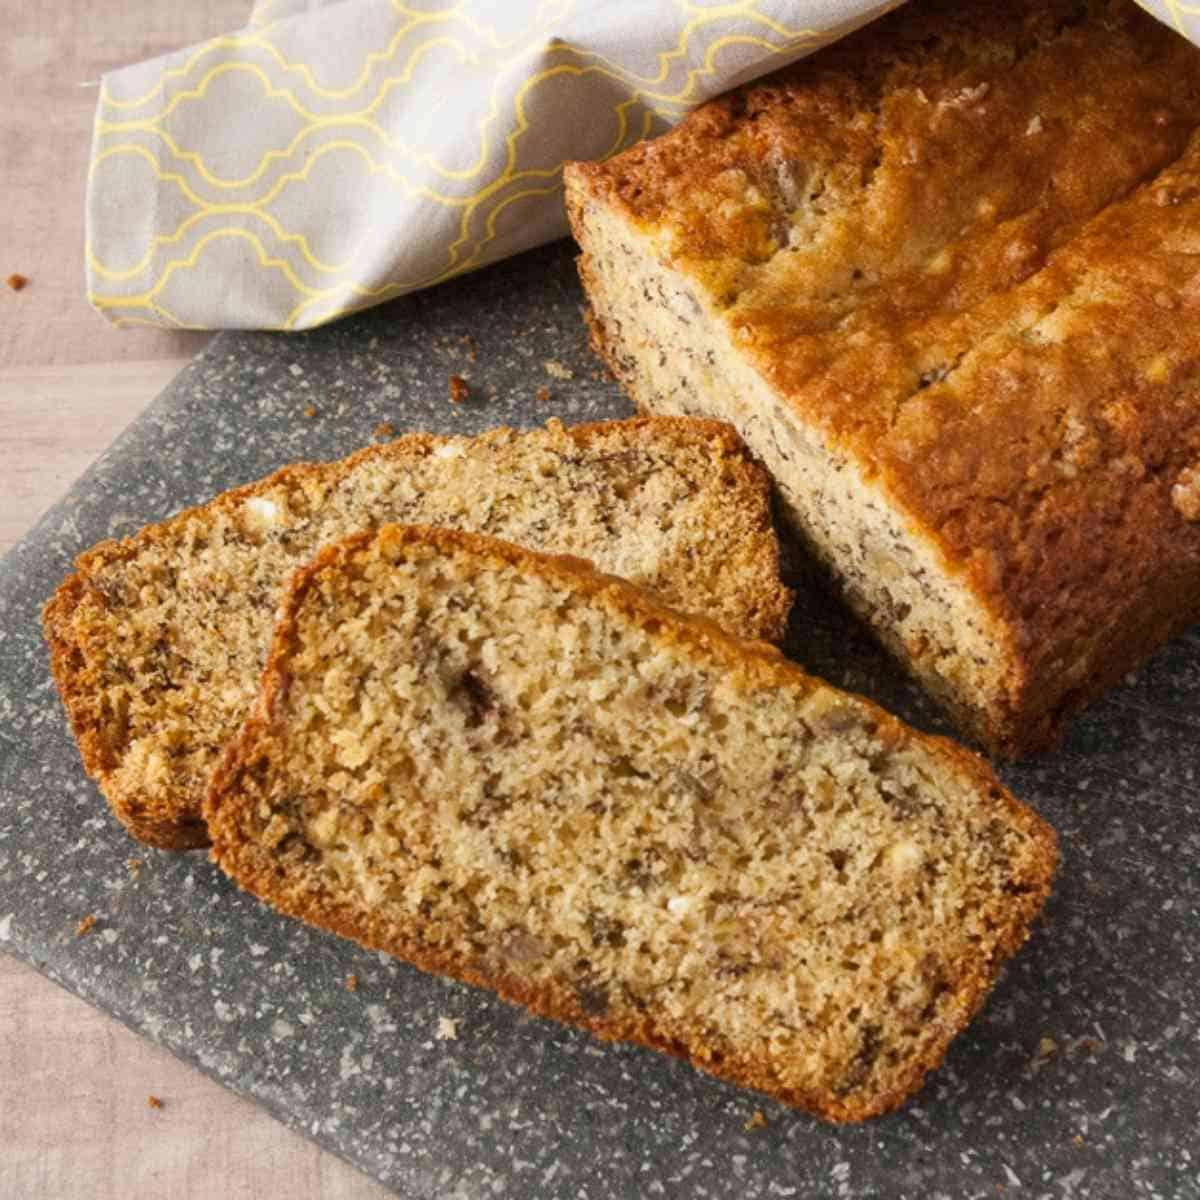 Sliced loaf of banana bread.